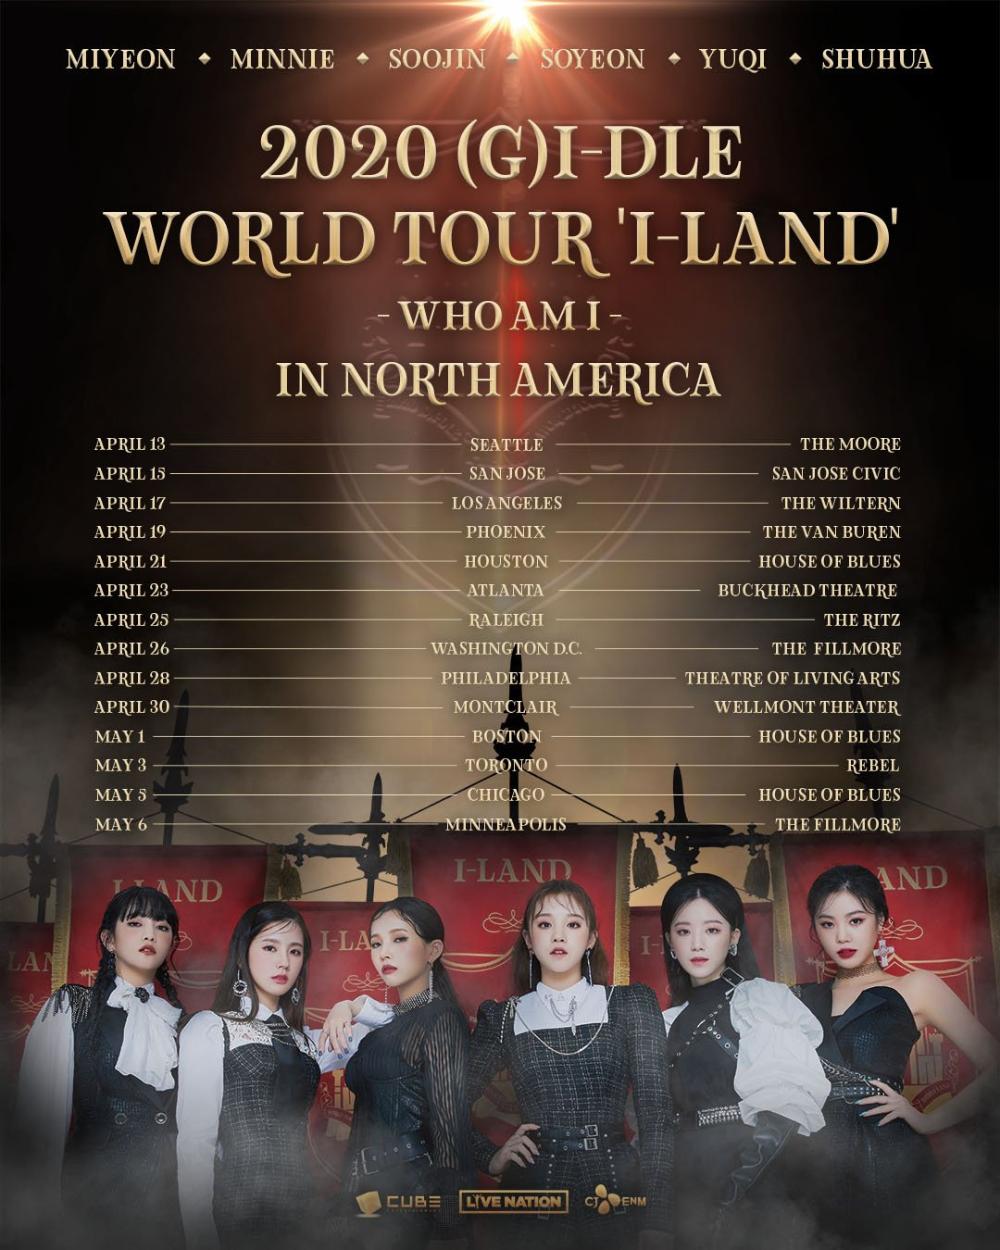 Pin De Jeon Jiwoo Em G Idle Em 2020 Soyeon